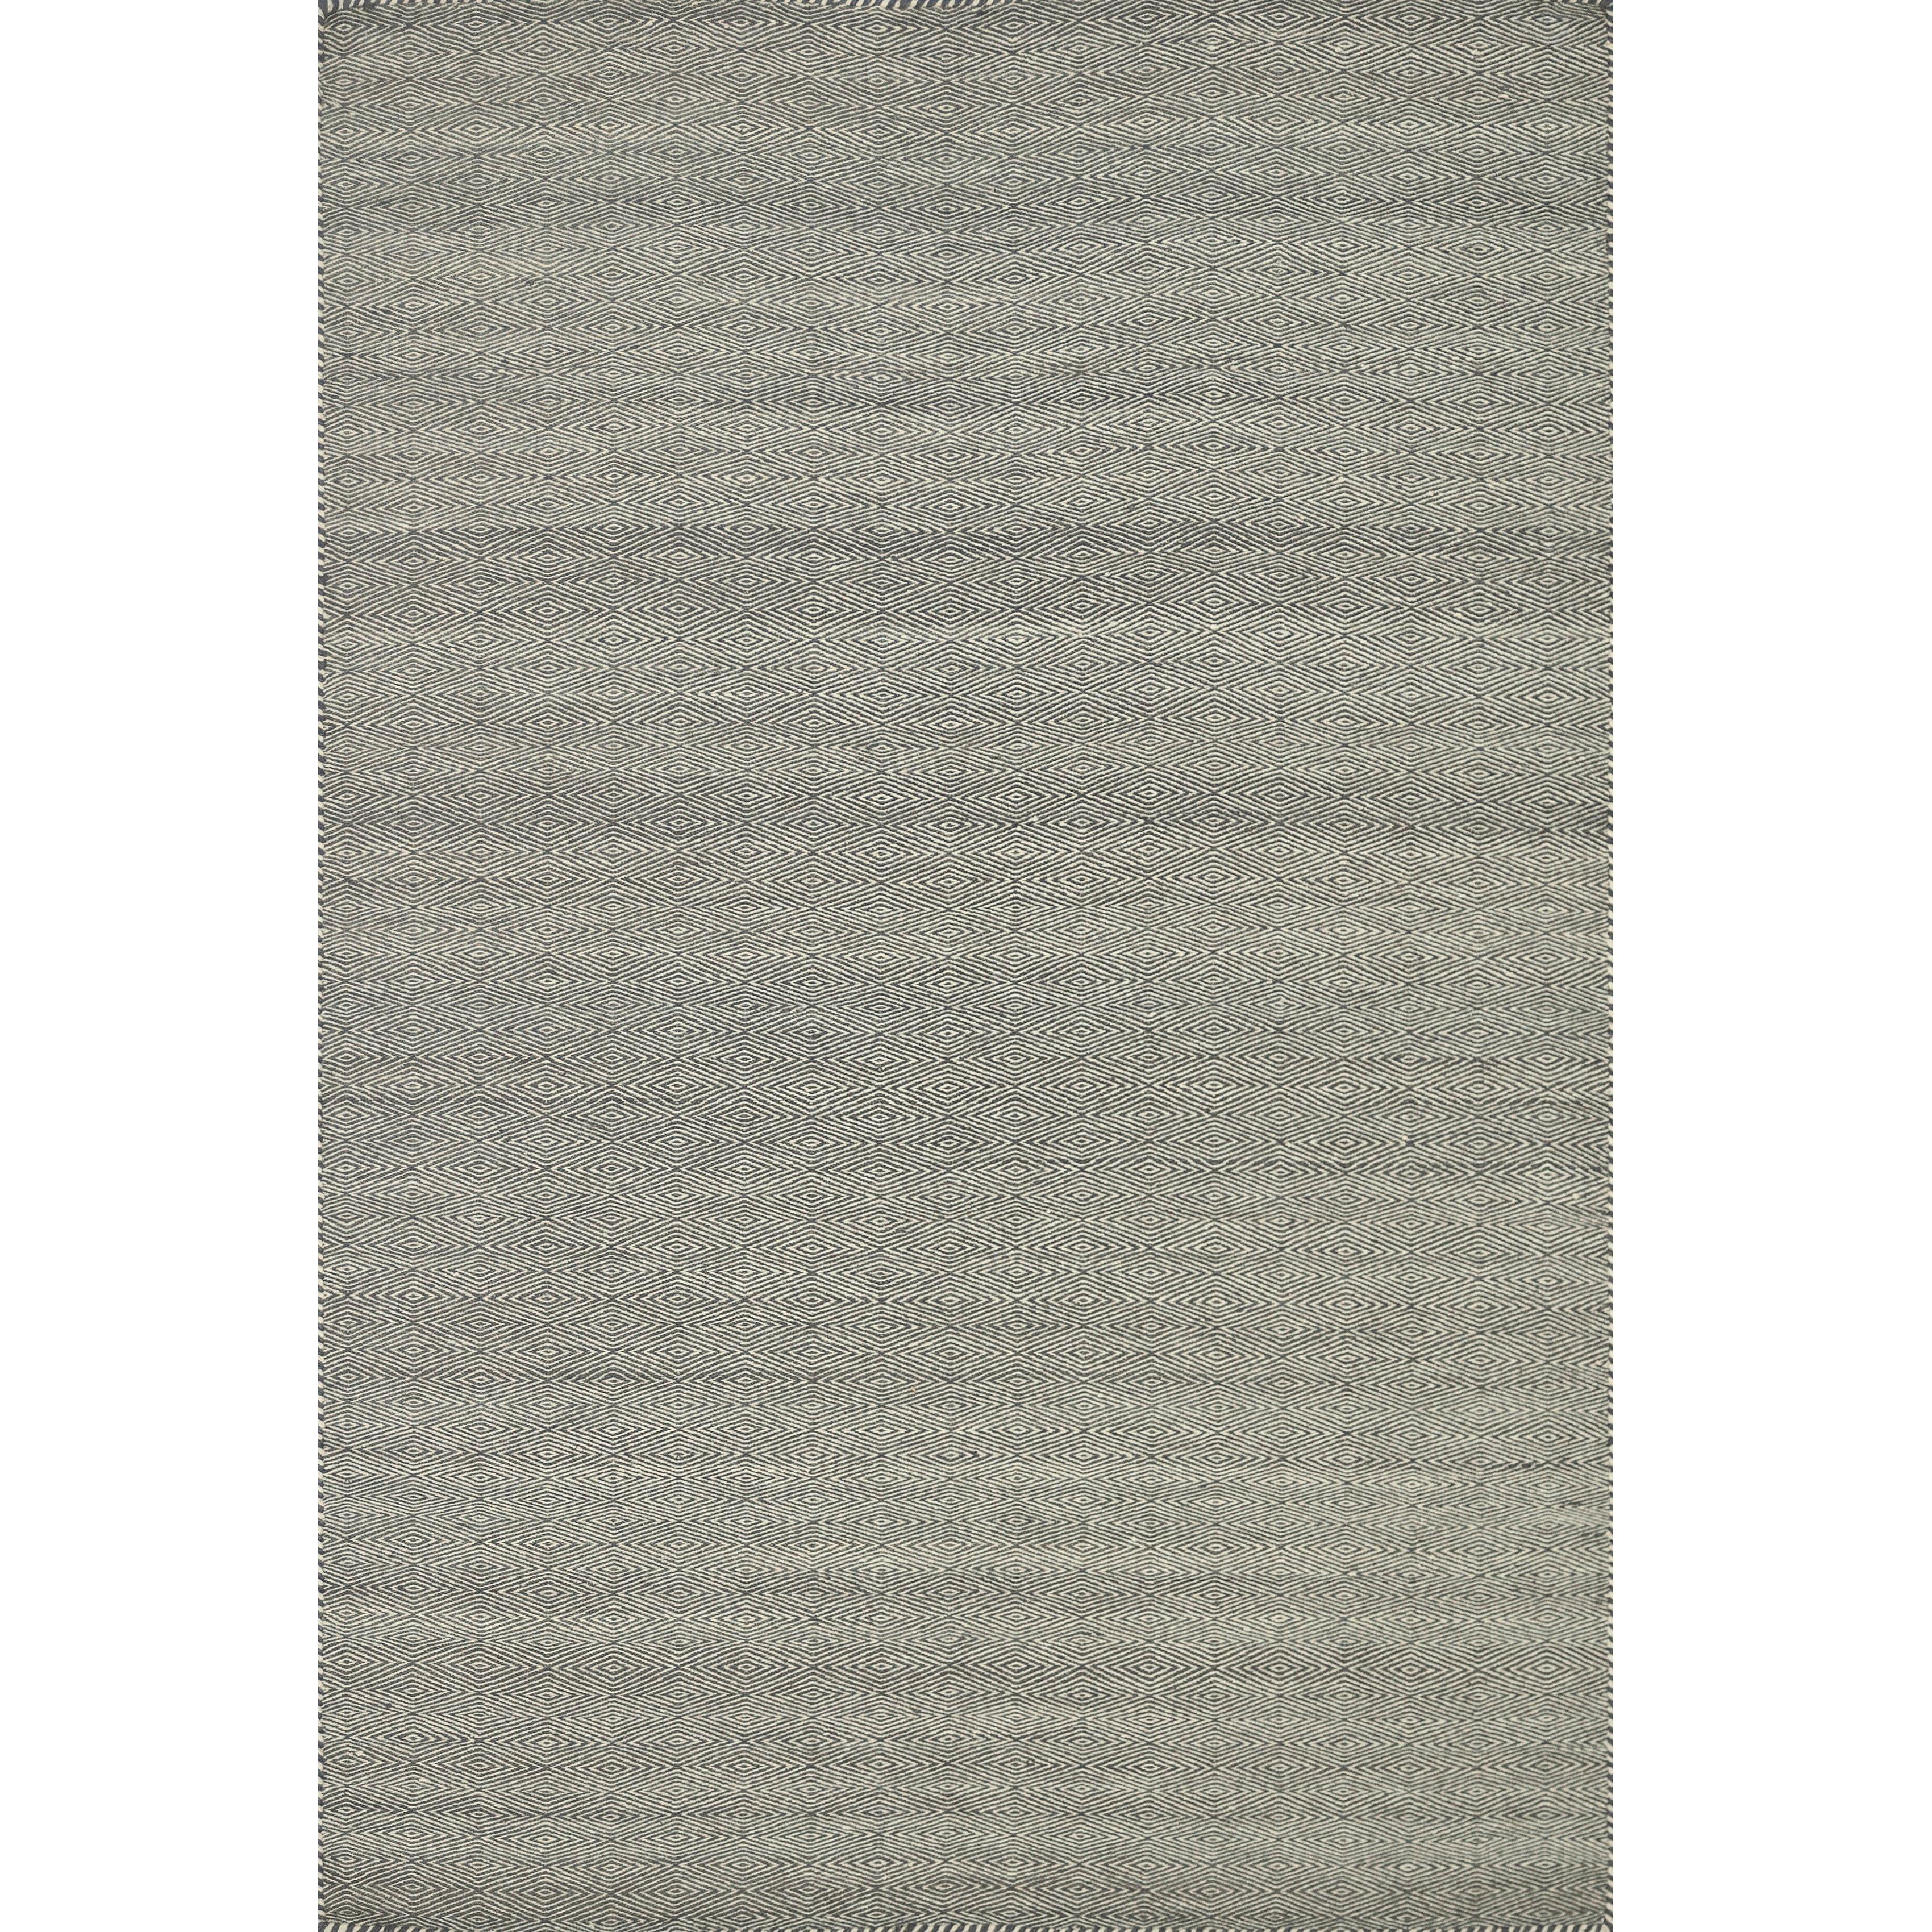 Alexander Home Hand-woven Poplin Smoke Wool/ Cotton Rug (3'6 x 5'6) at Sears.com